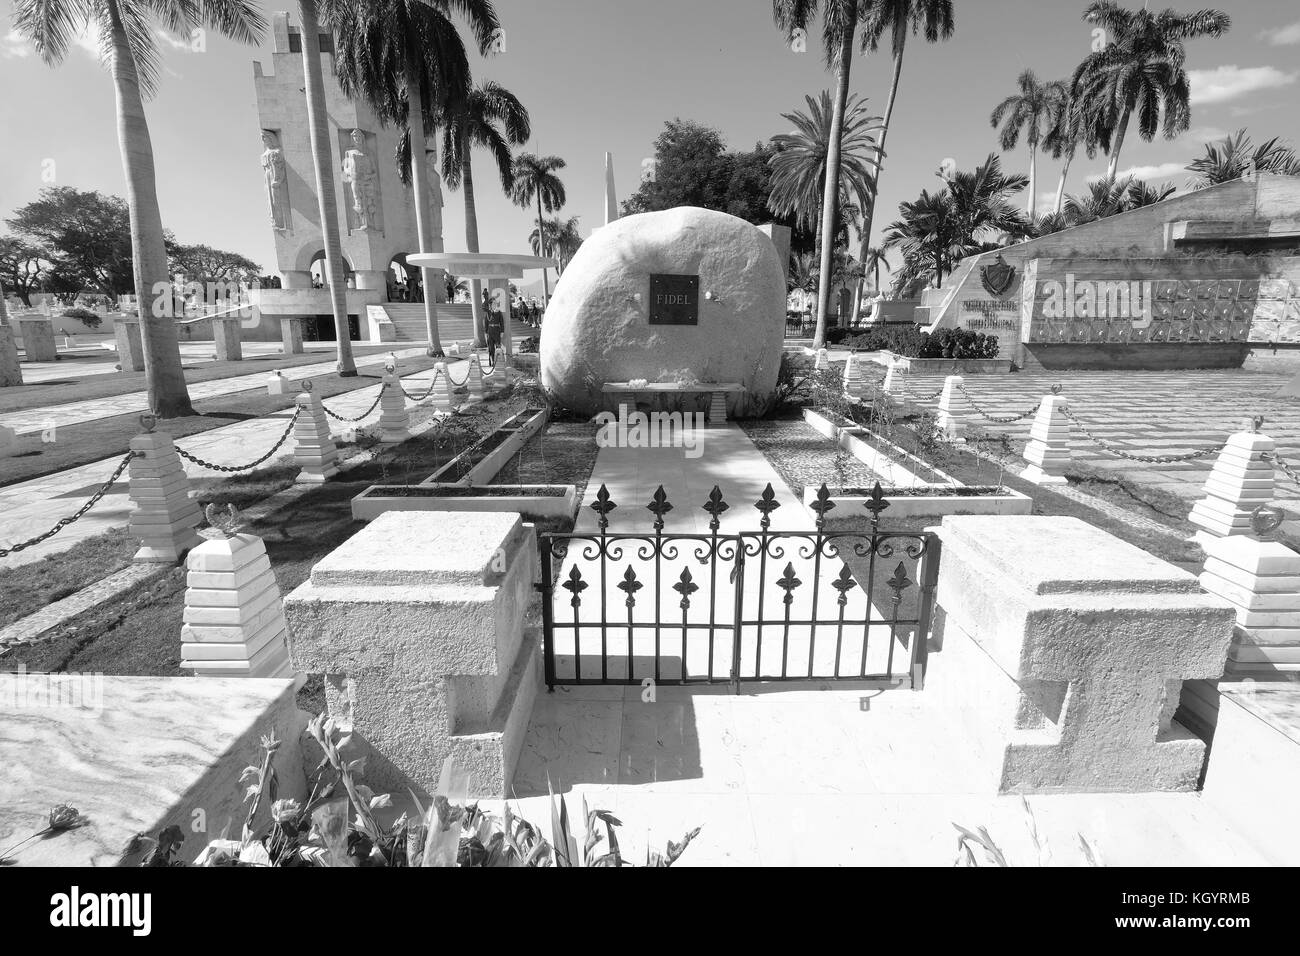 Sehenswürdigkeiten außerhalb des Fidel Castro Grab, Santa ifigenia Friedhof, Santiago de Cuba, Kuba Stockbild